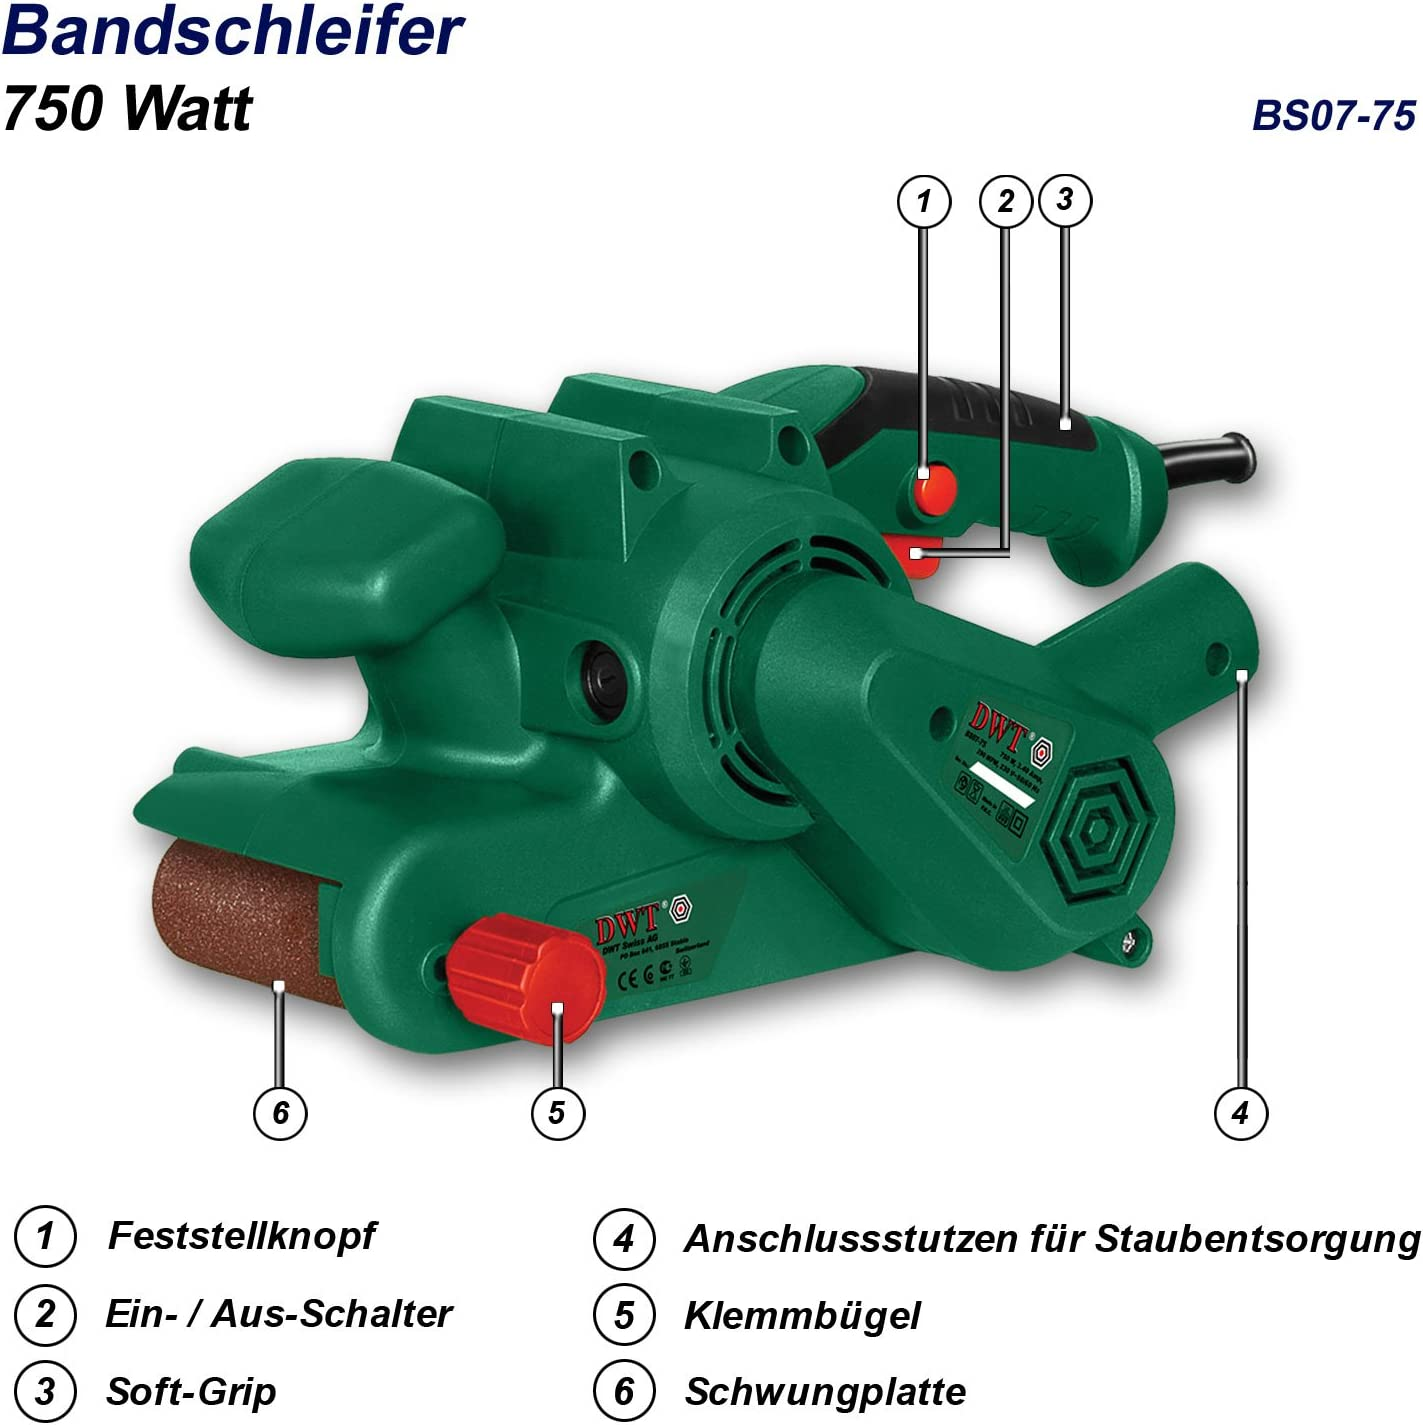 DWT Bandschleifer Schleifer 750 W BS07-75